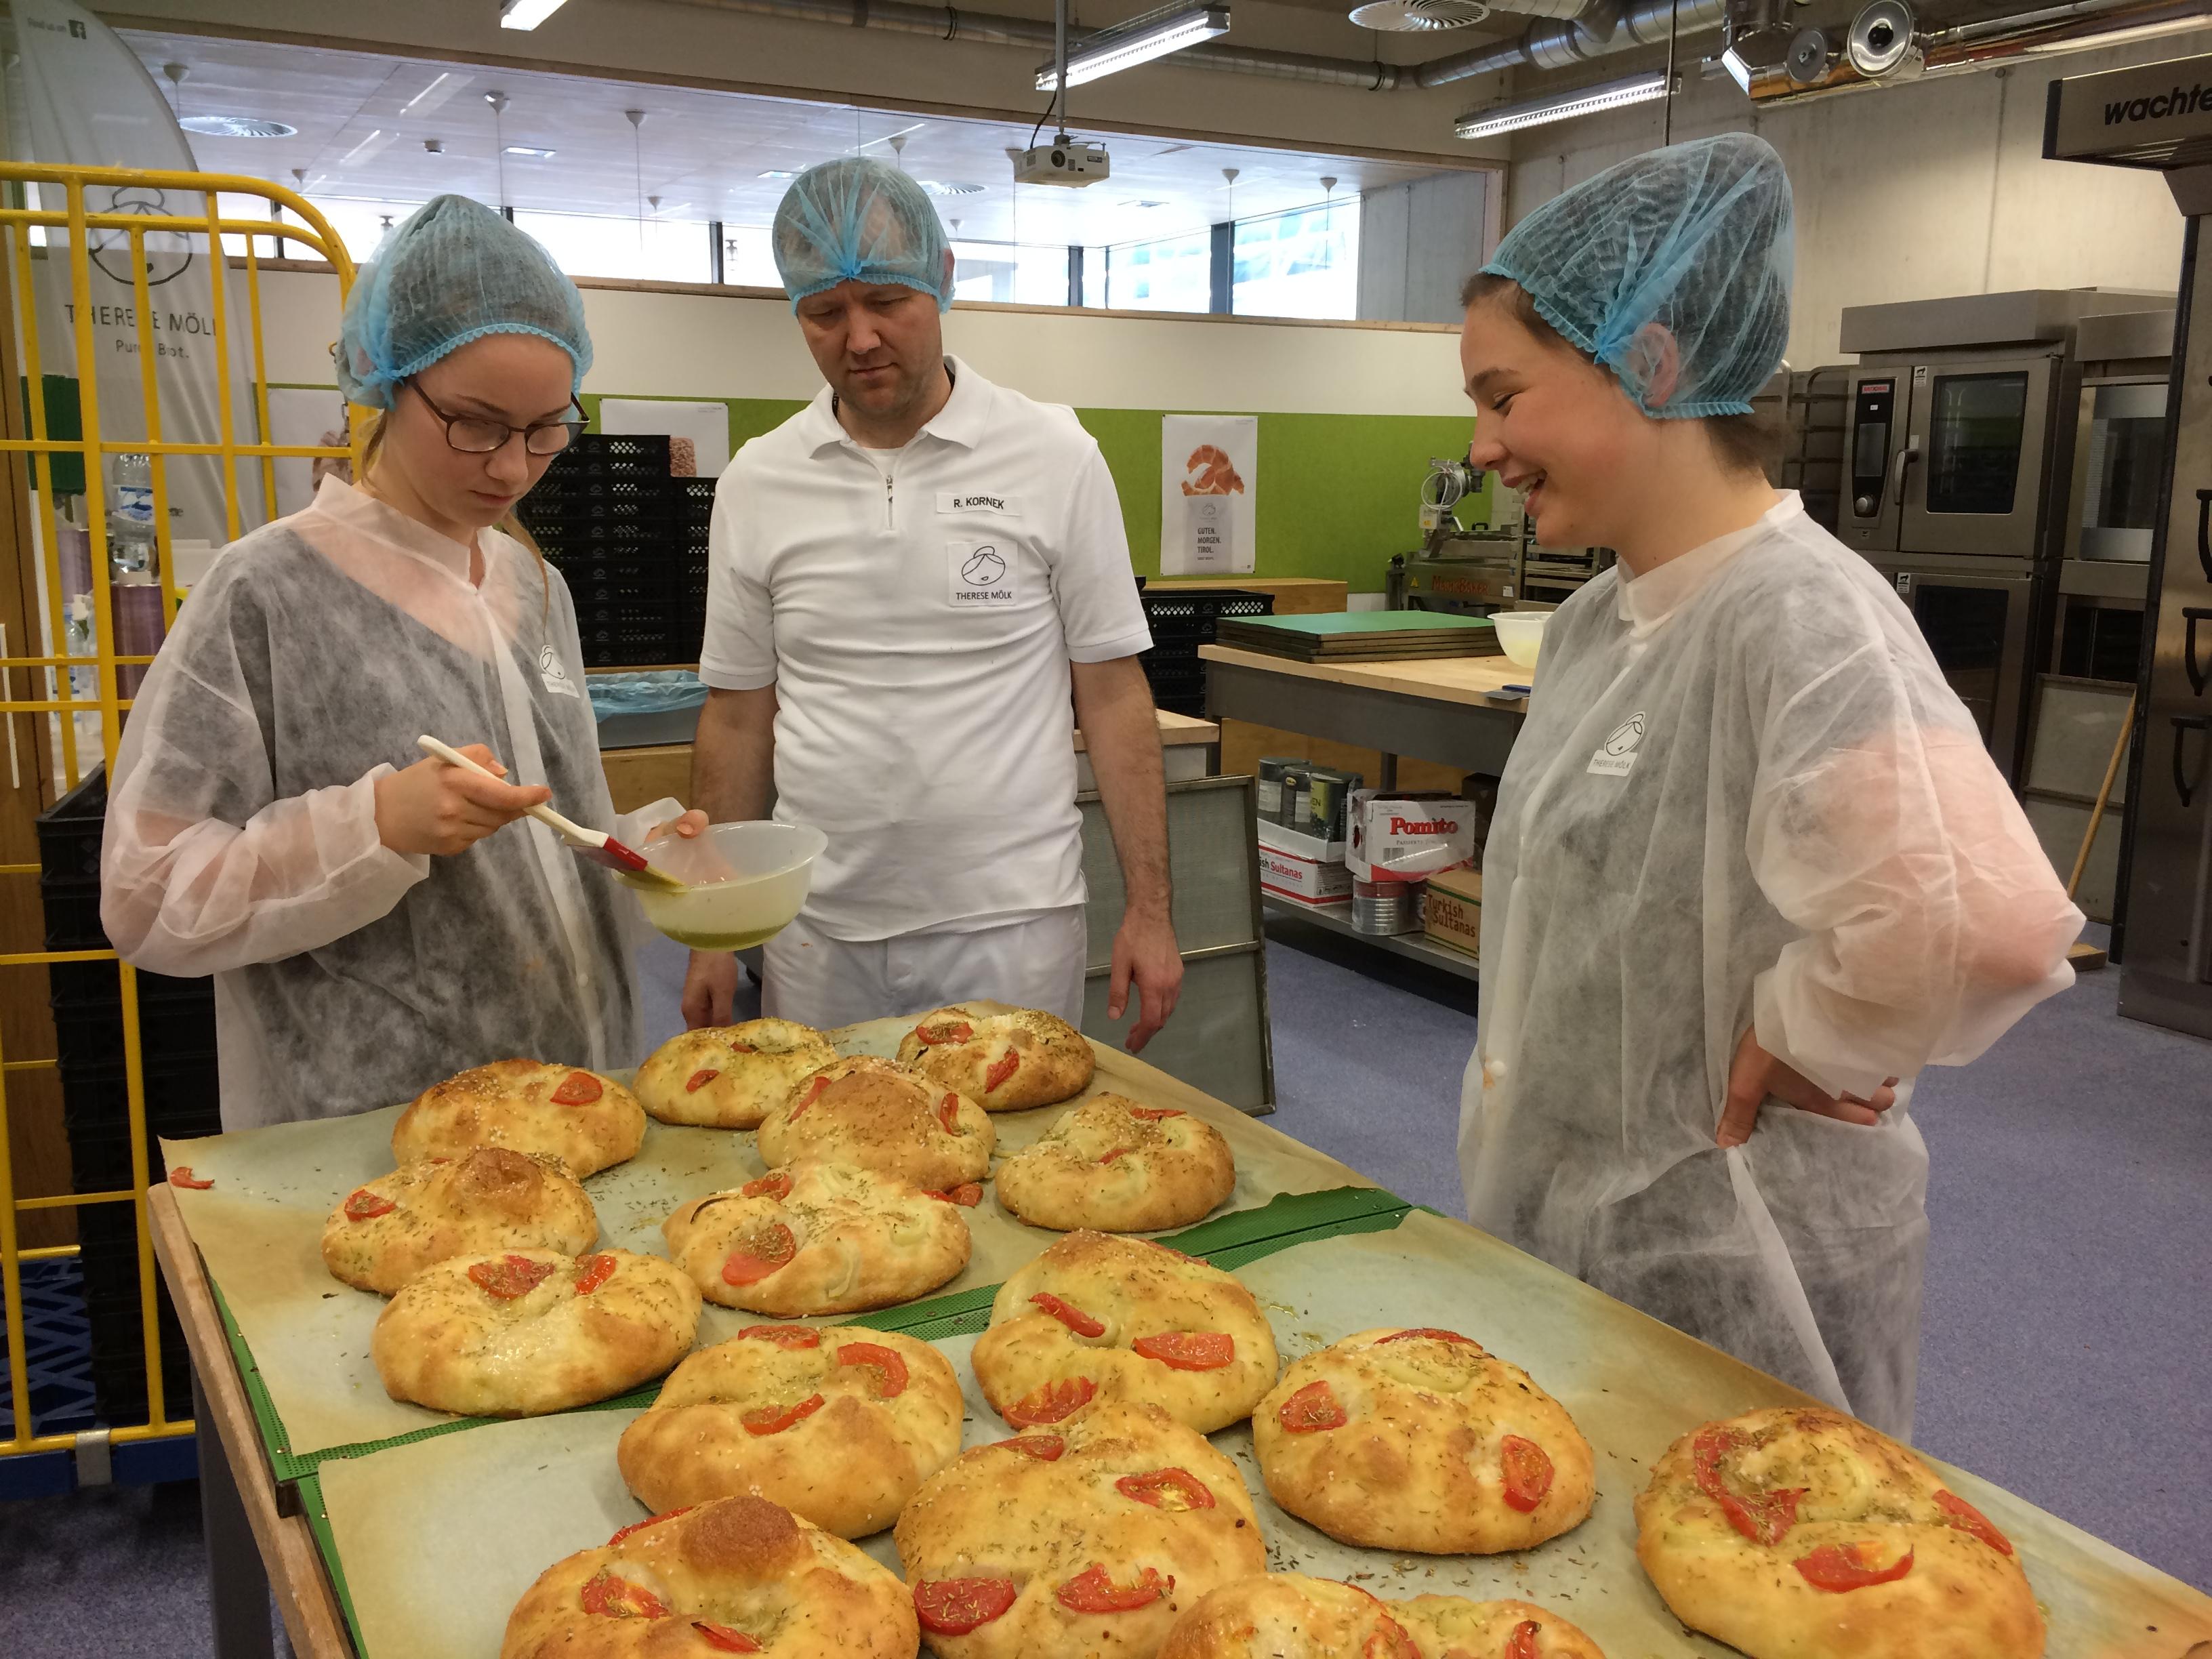 Therese Mölk Bäckerei Waldorfschüler